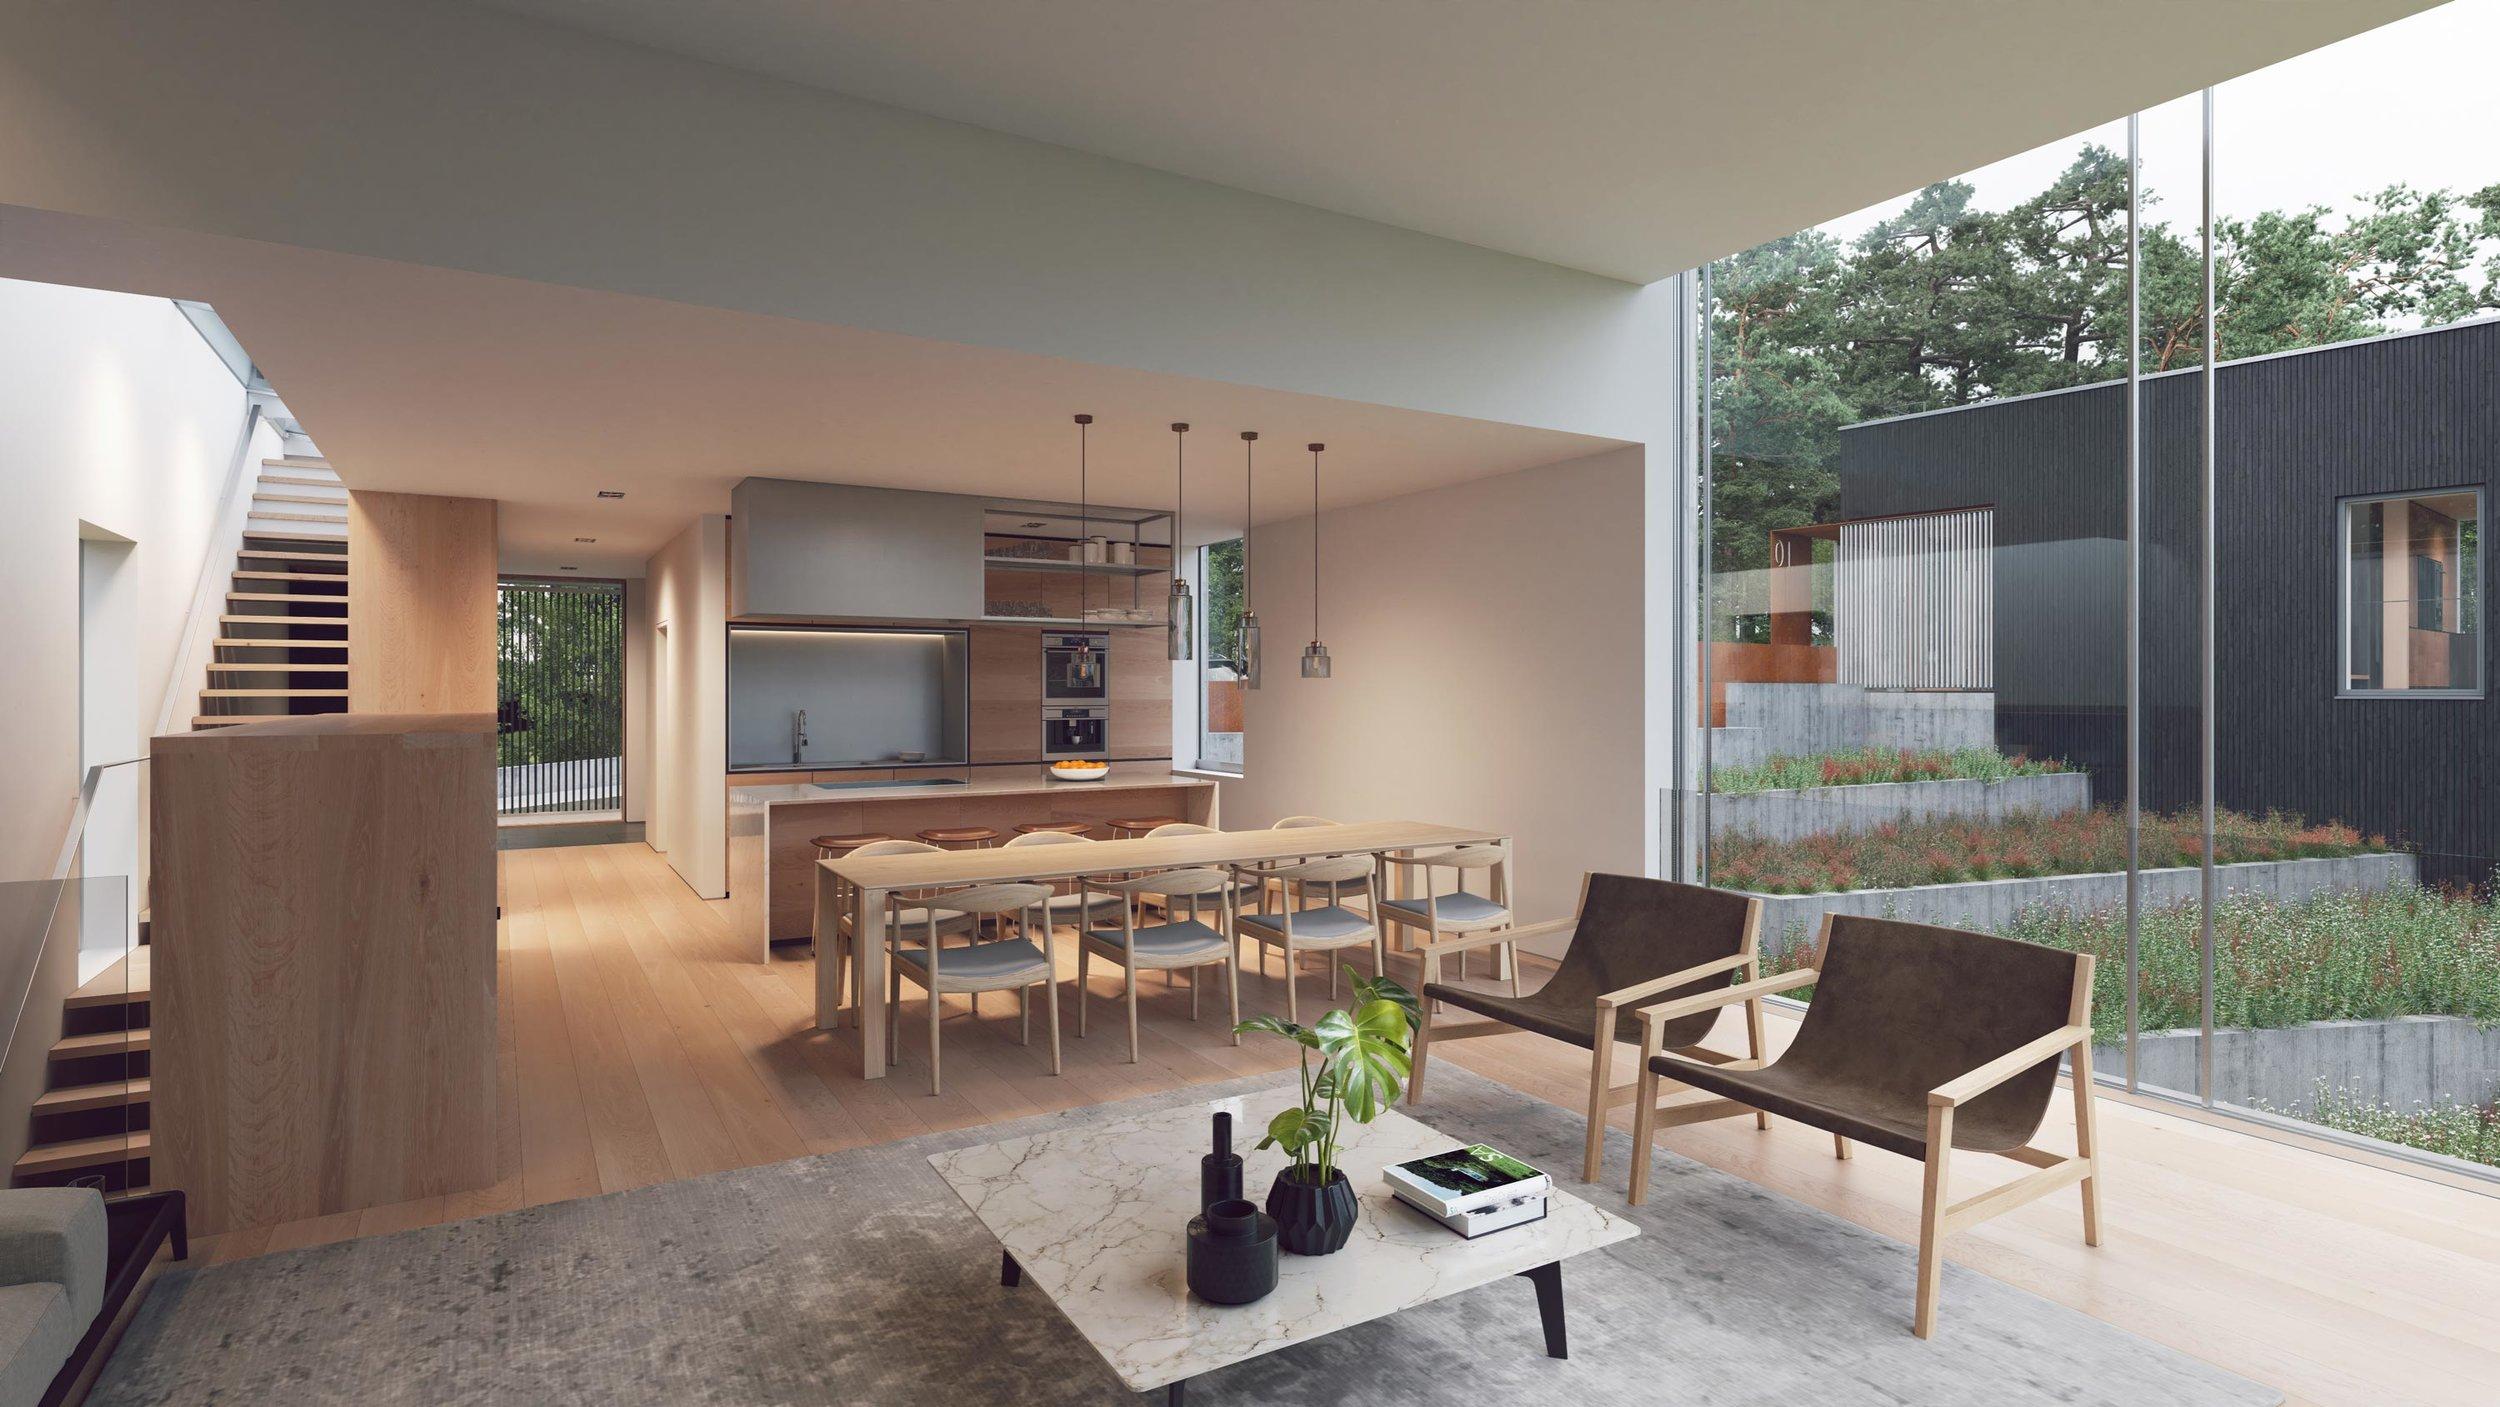 pyrus luxury villas, strom architects, imola, 8.jpg